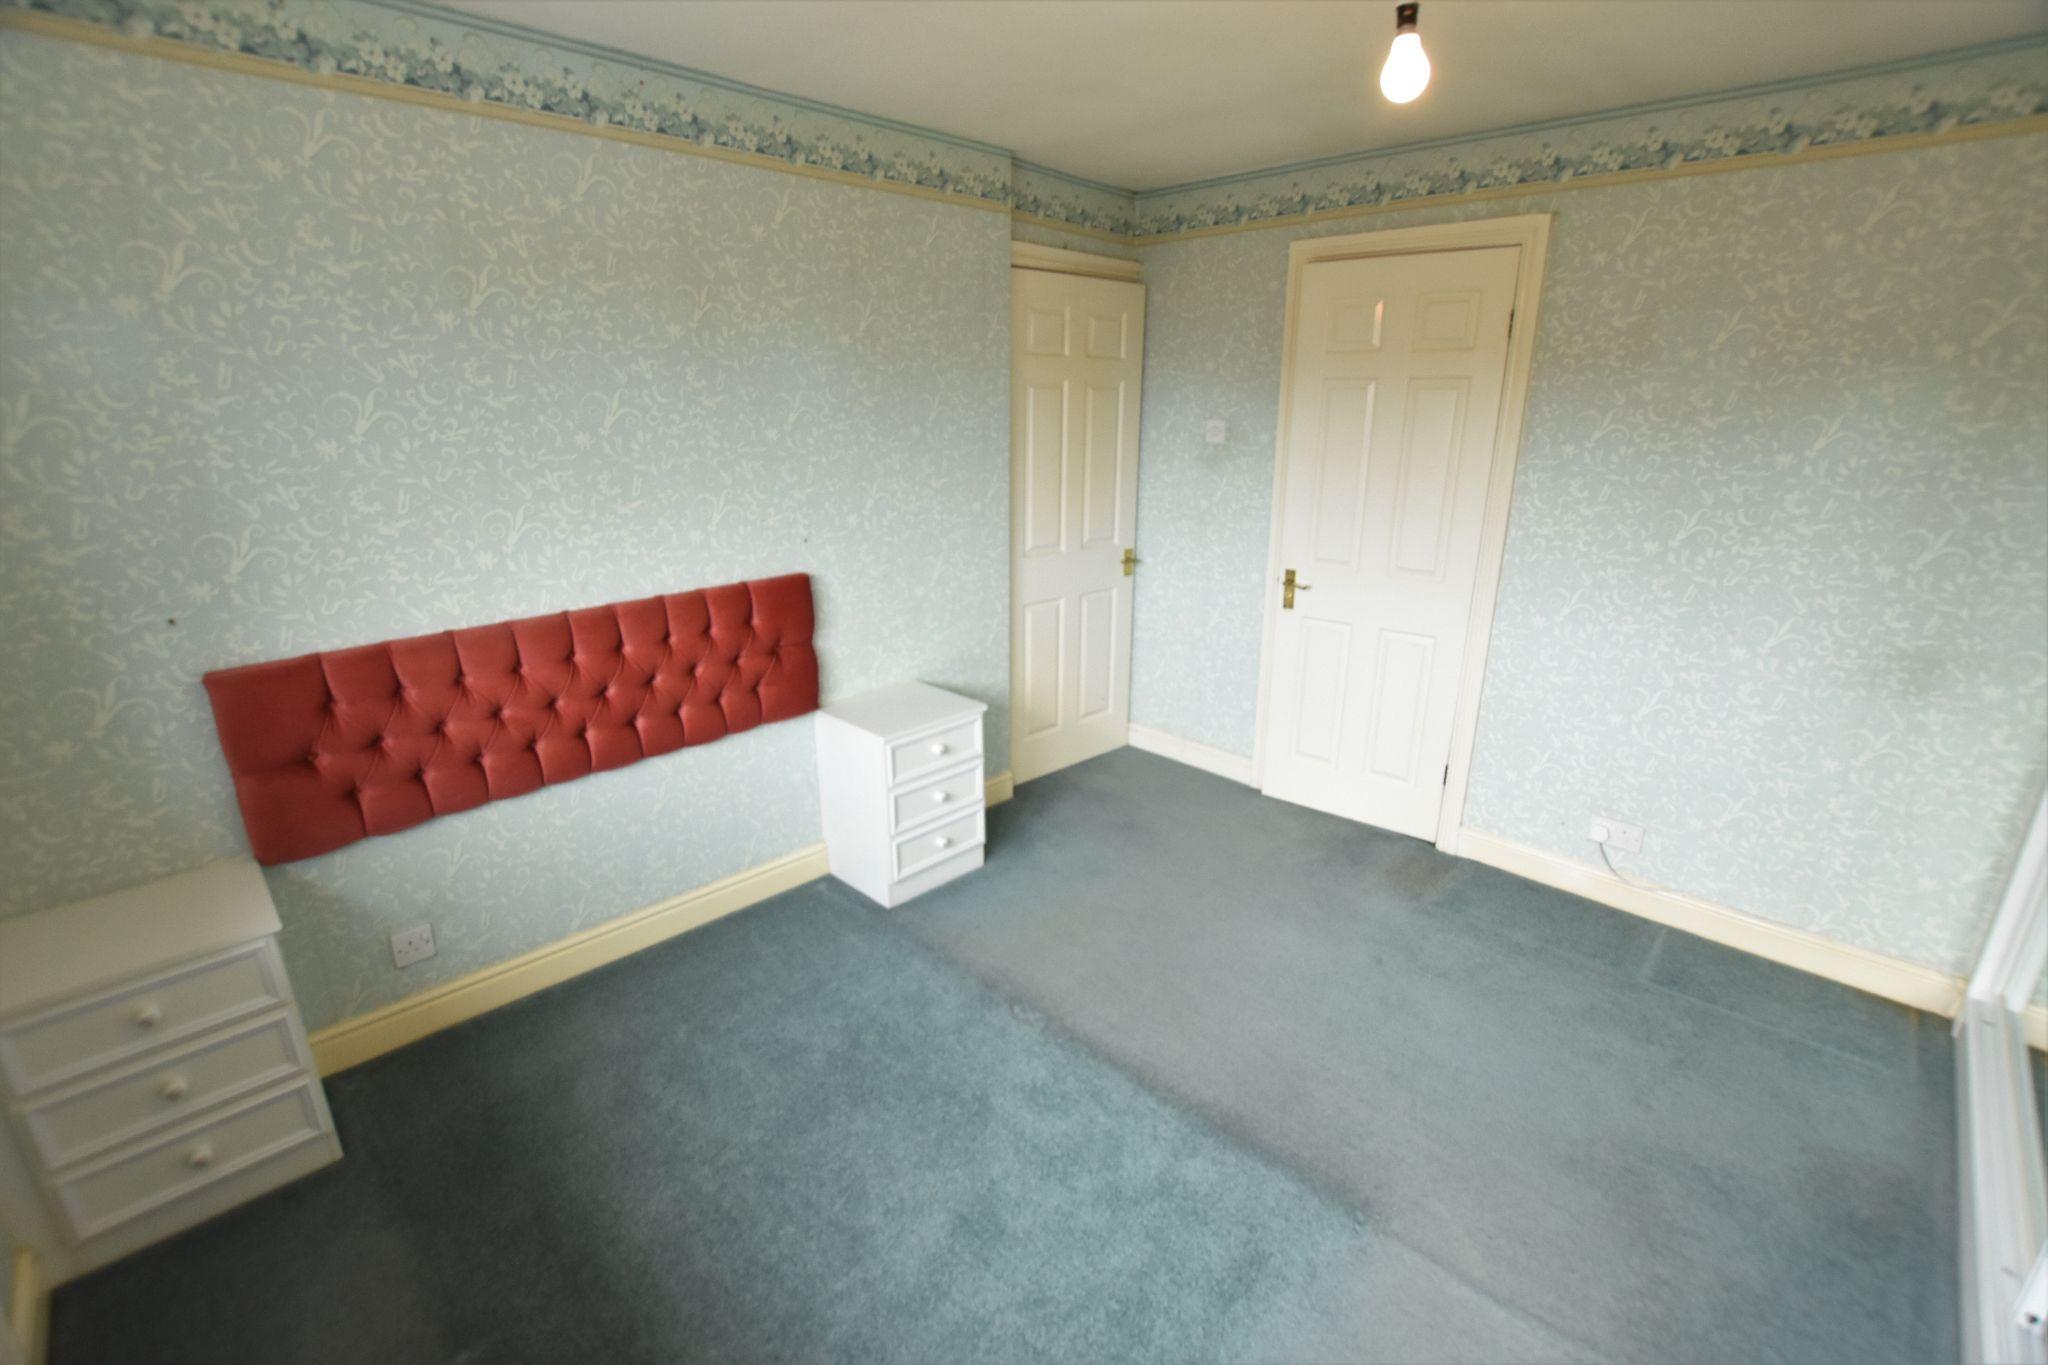 4 bedroom detached house Sold STC in Preston - Bedroom 1